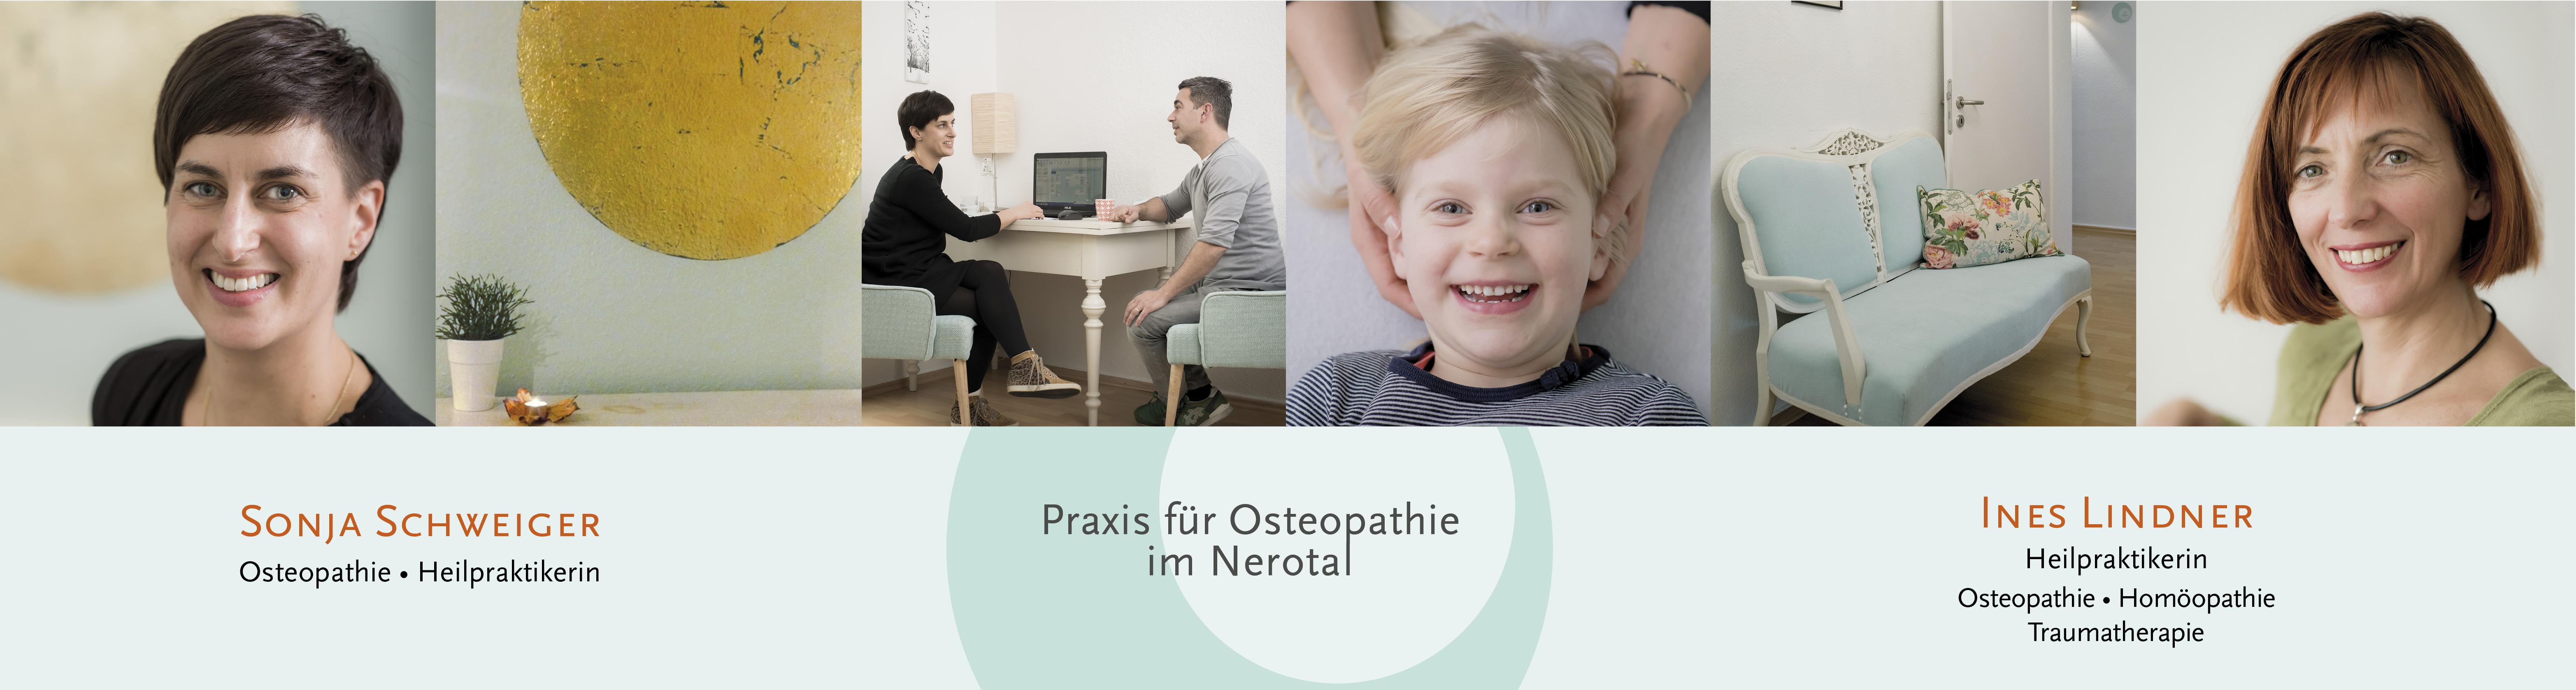 Osteopathie Wiesbaden – die Praxis im Nerotal